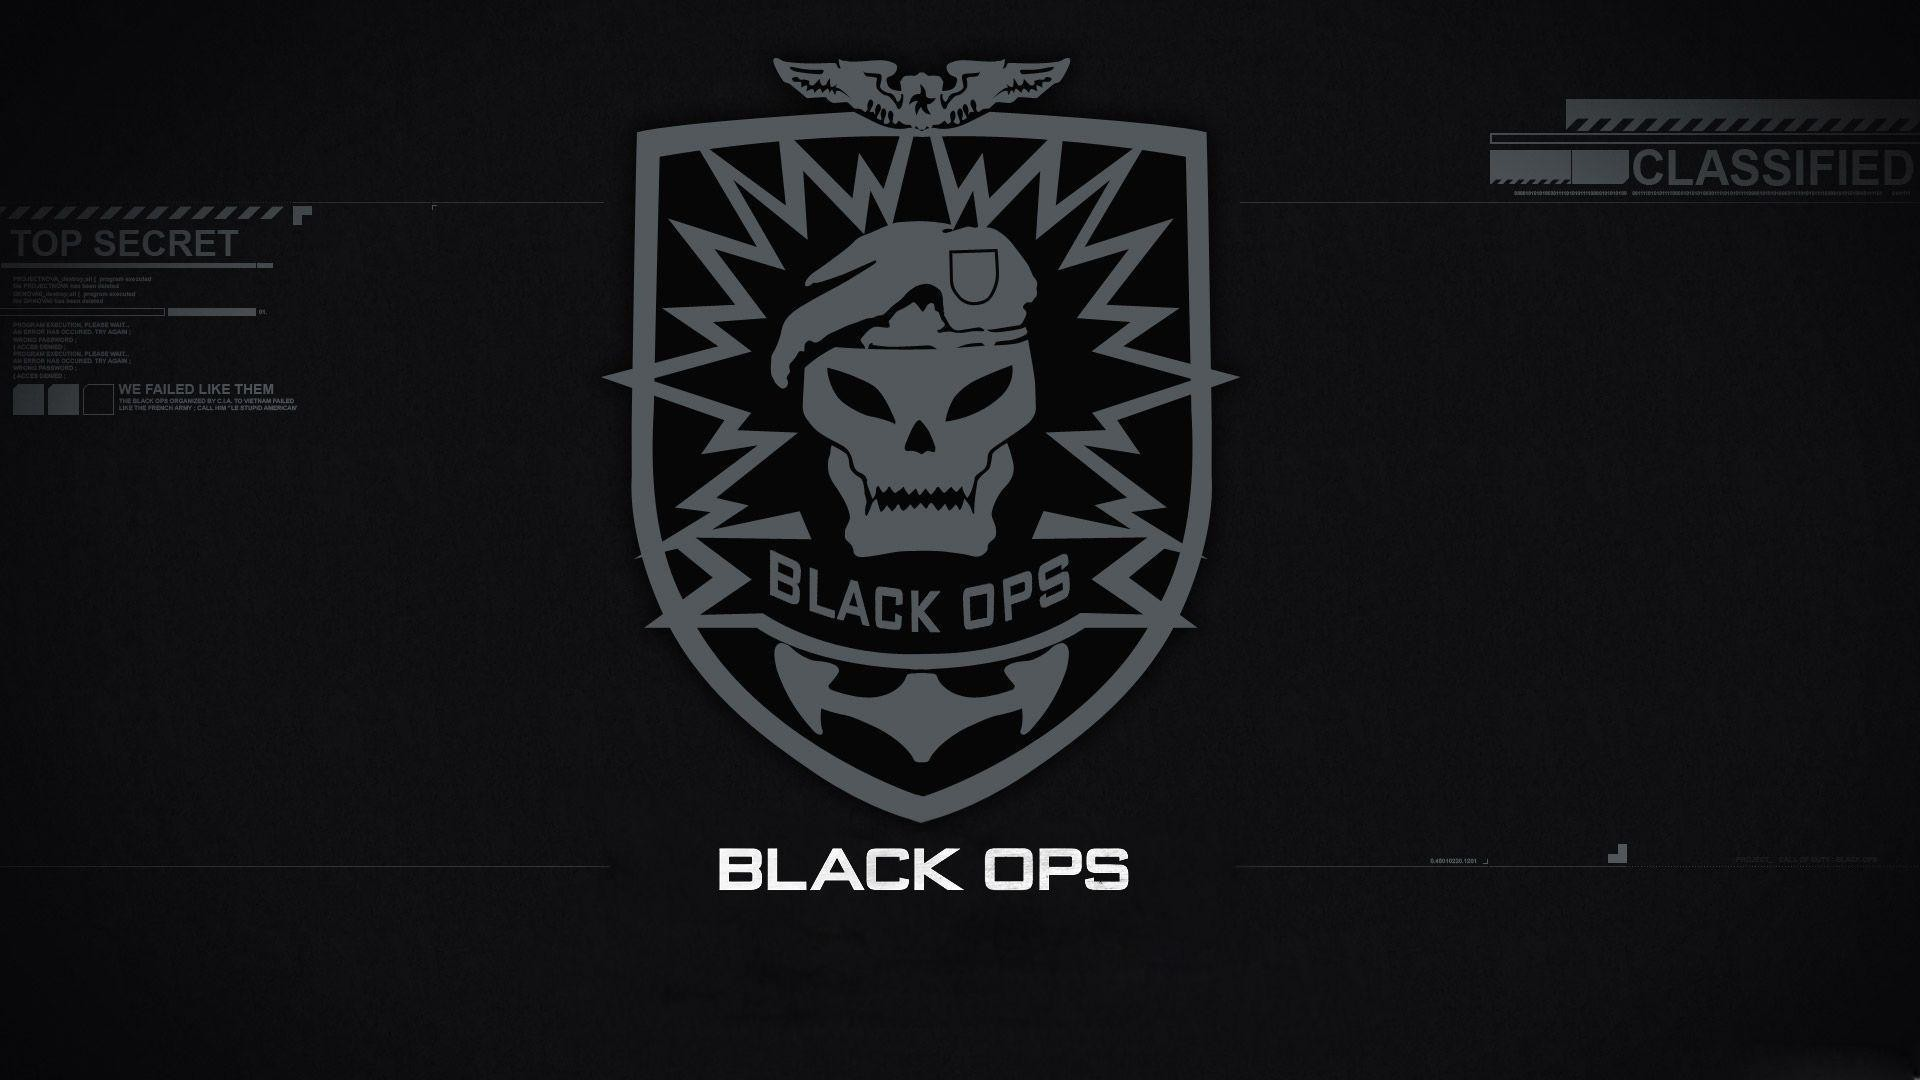 Games Call Of Duty Black Ops Wallpaper 1920×1080 HD Wallpaper .